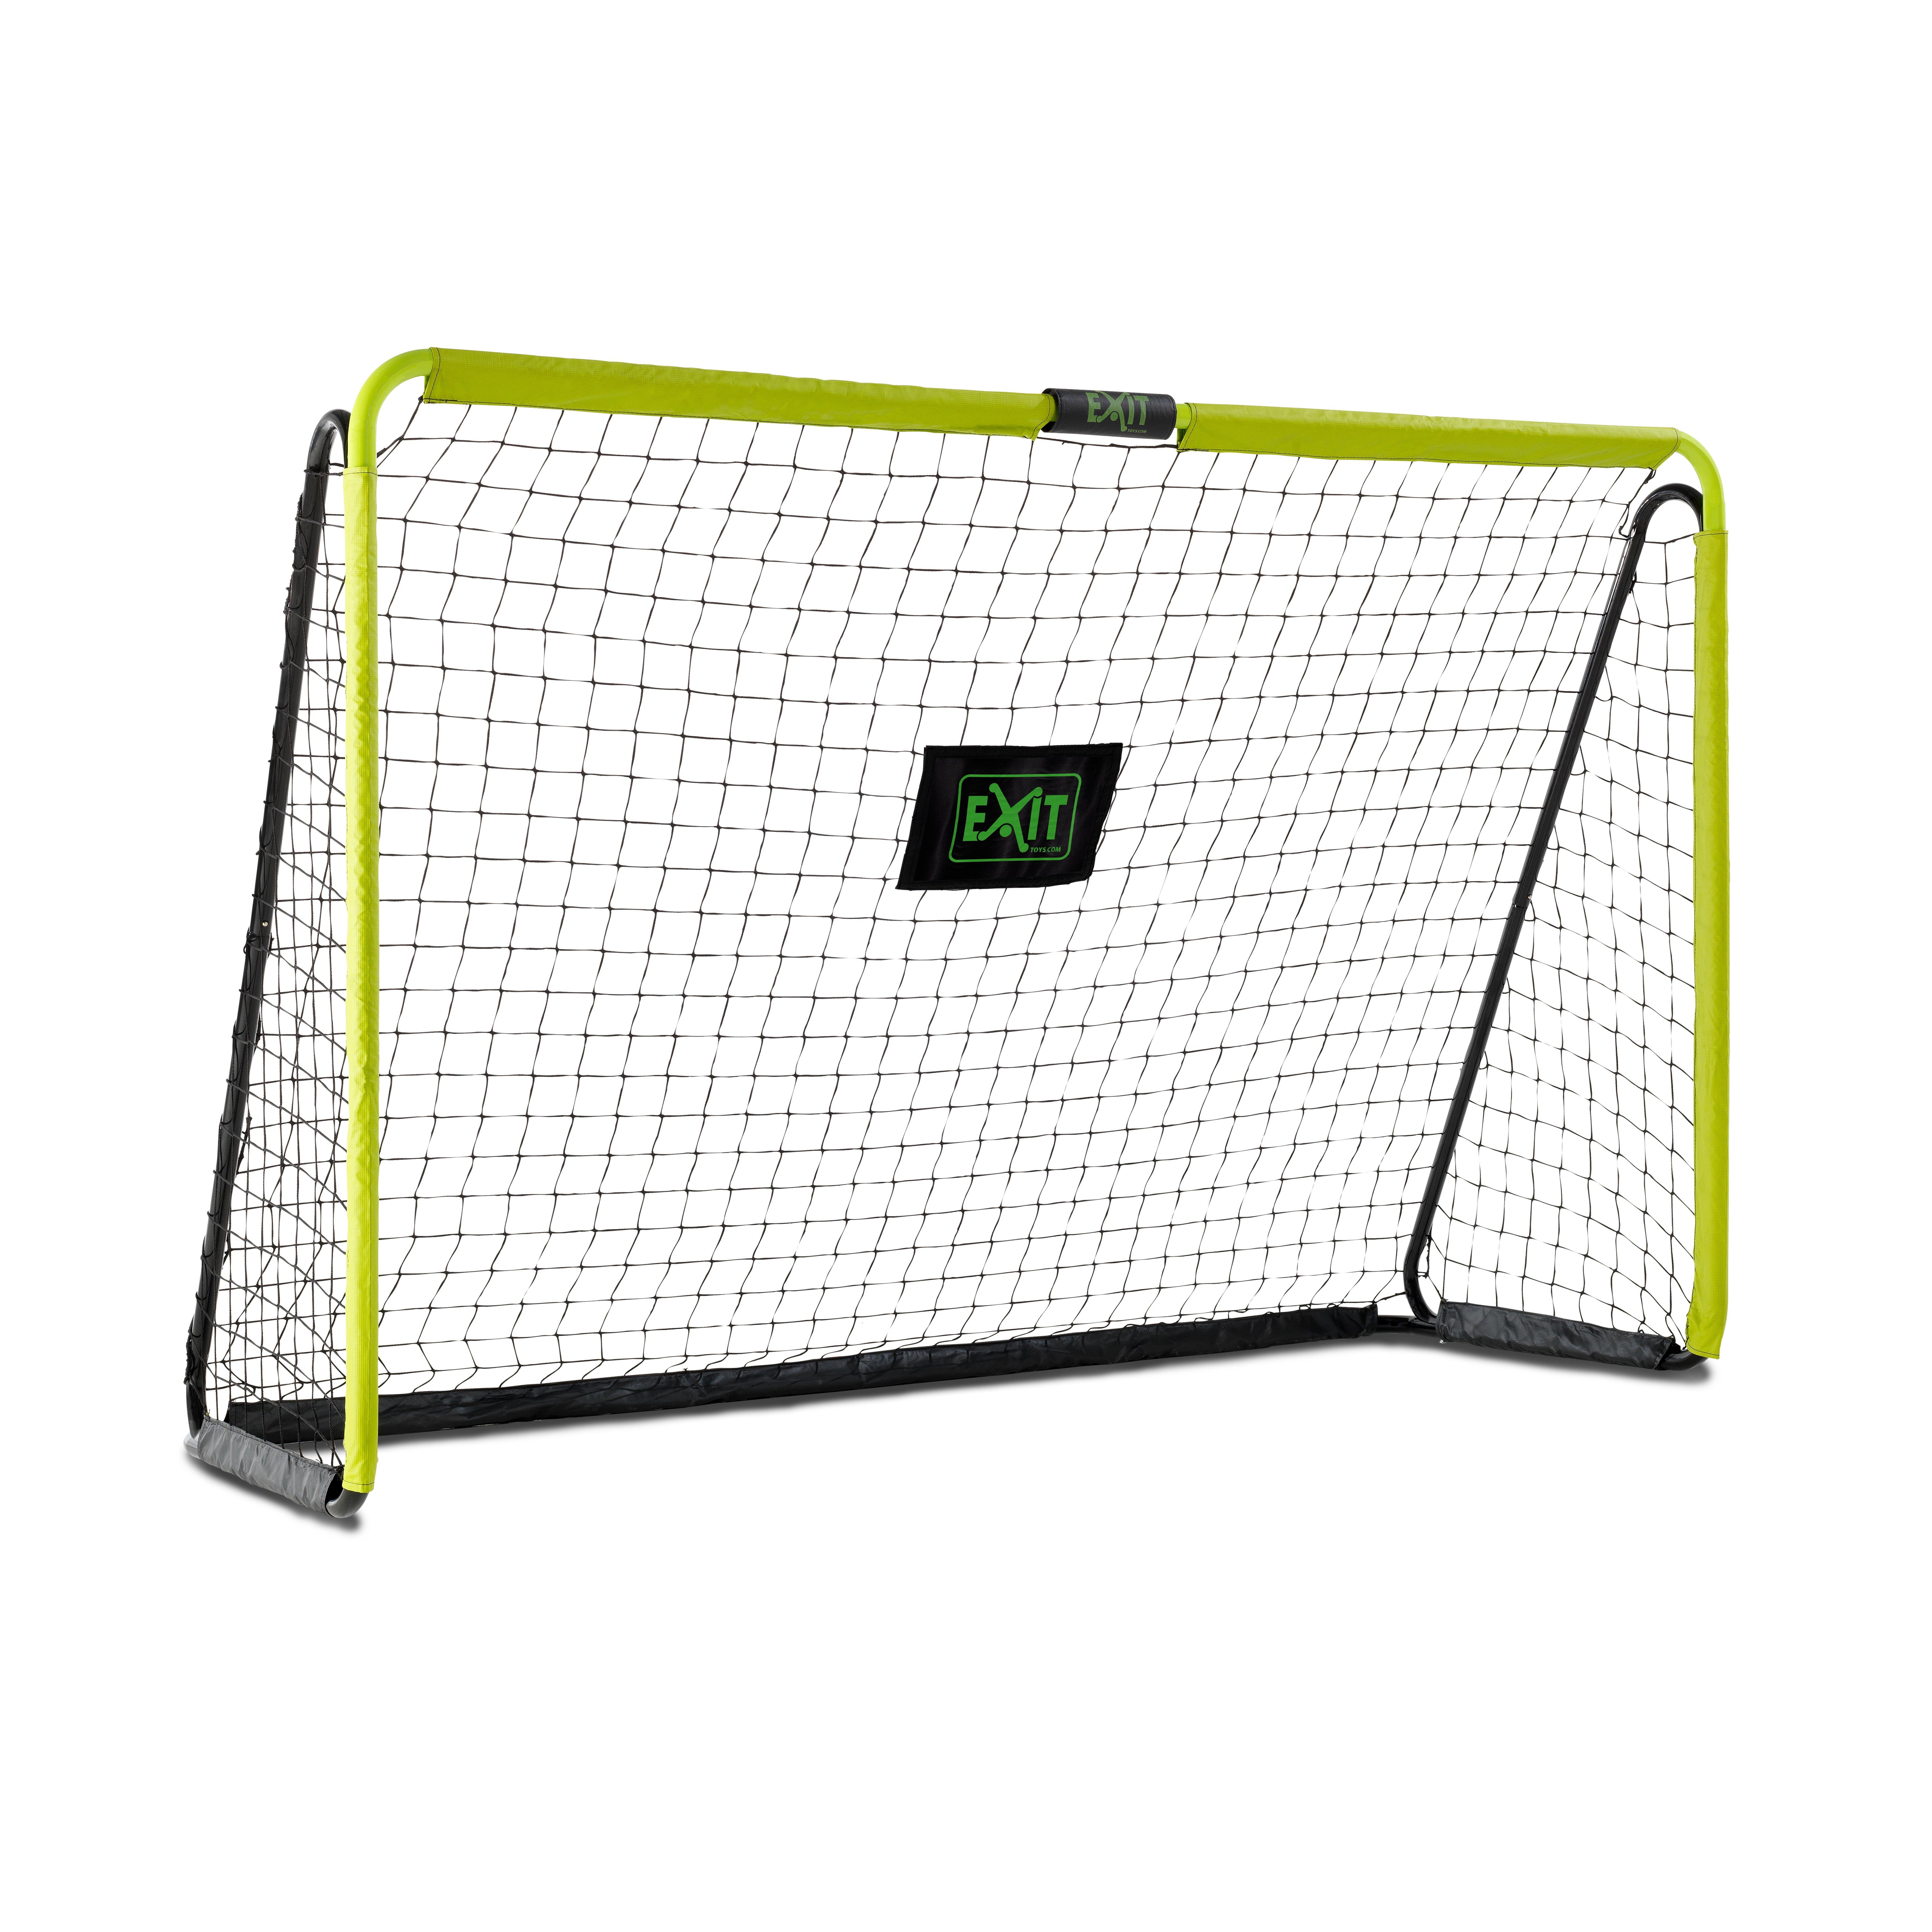 EXIT - Tempo 2400 Soccer Goal